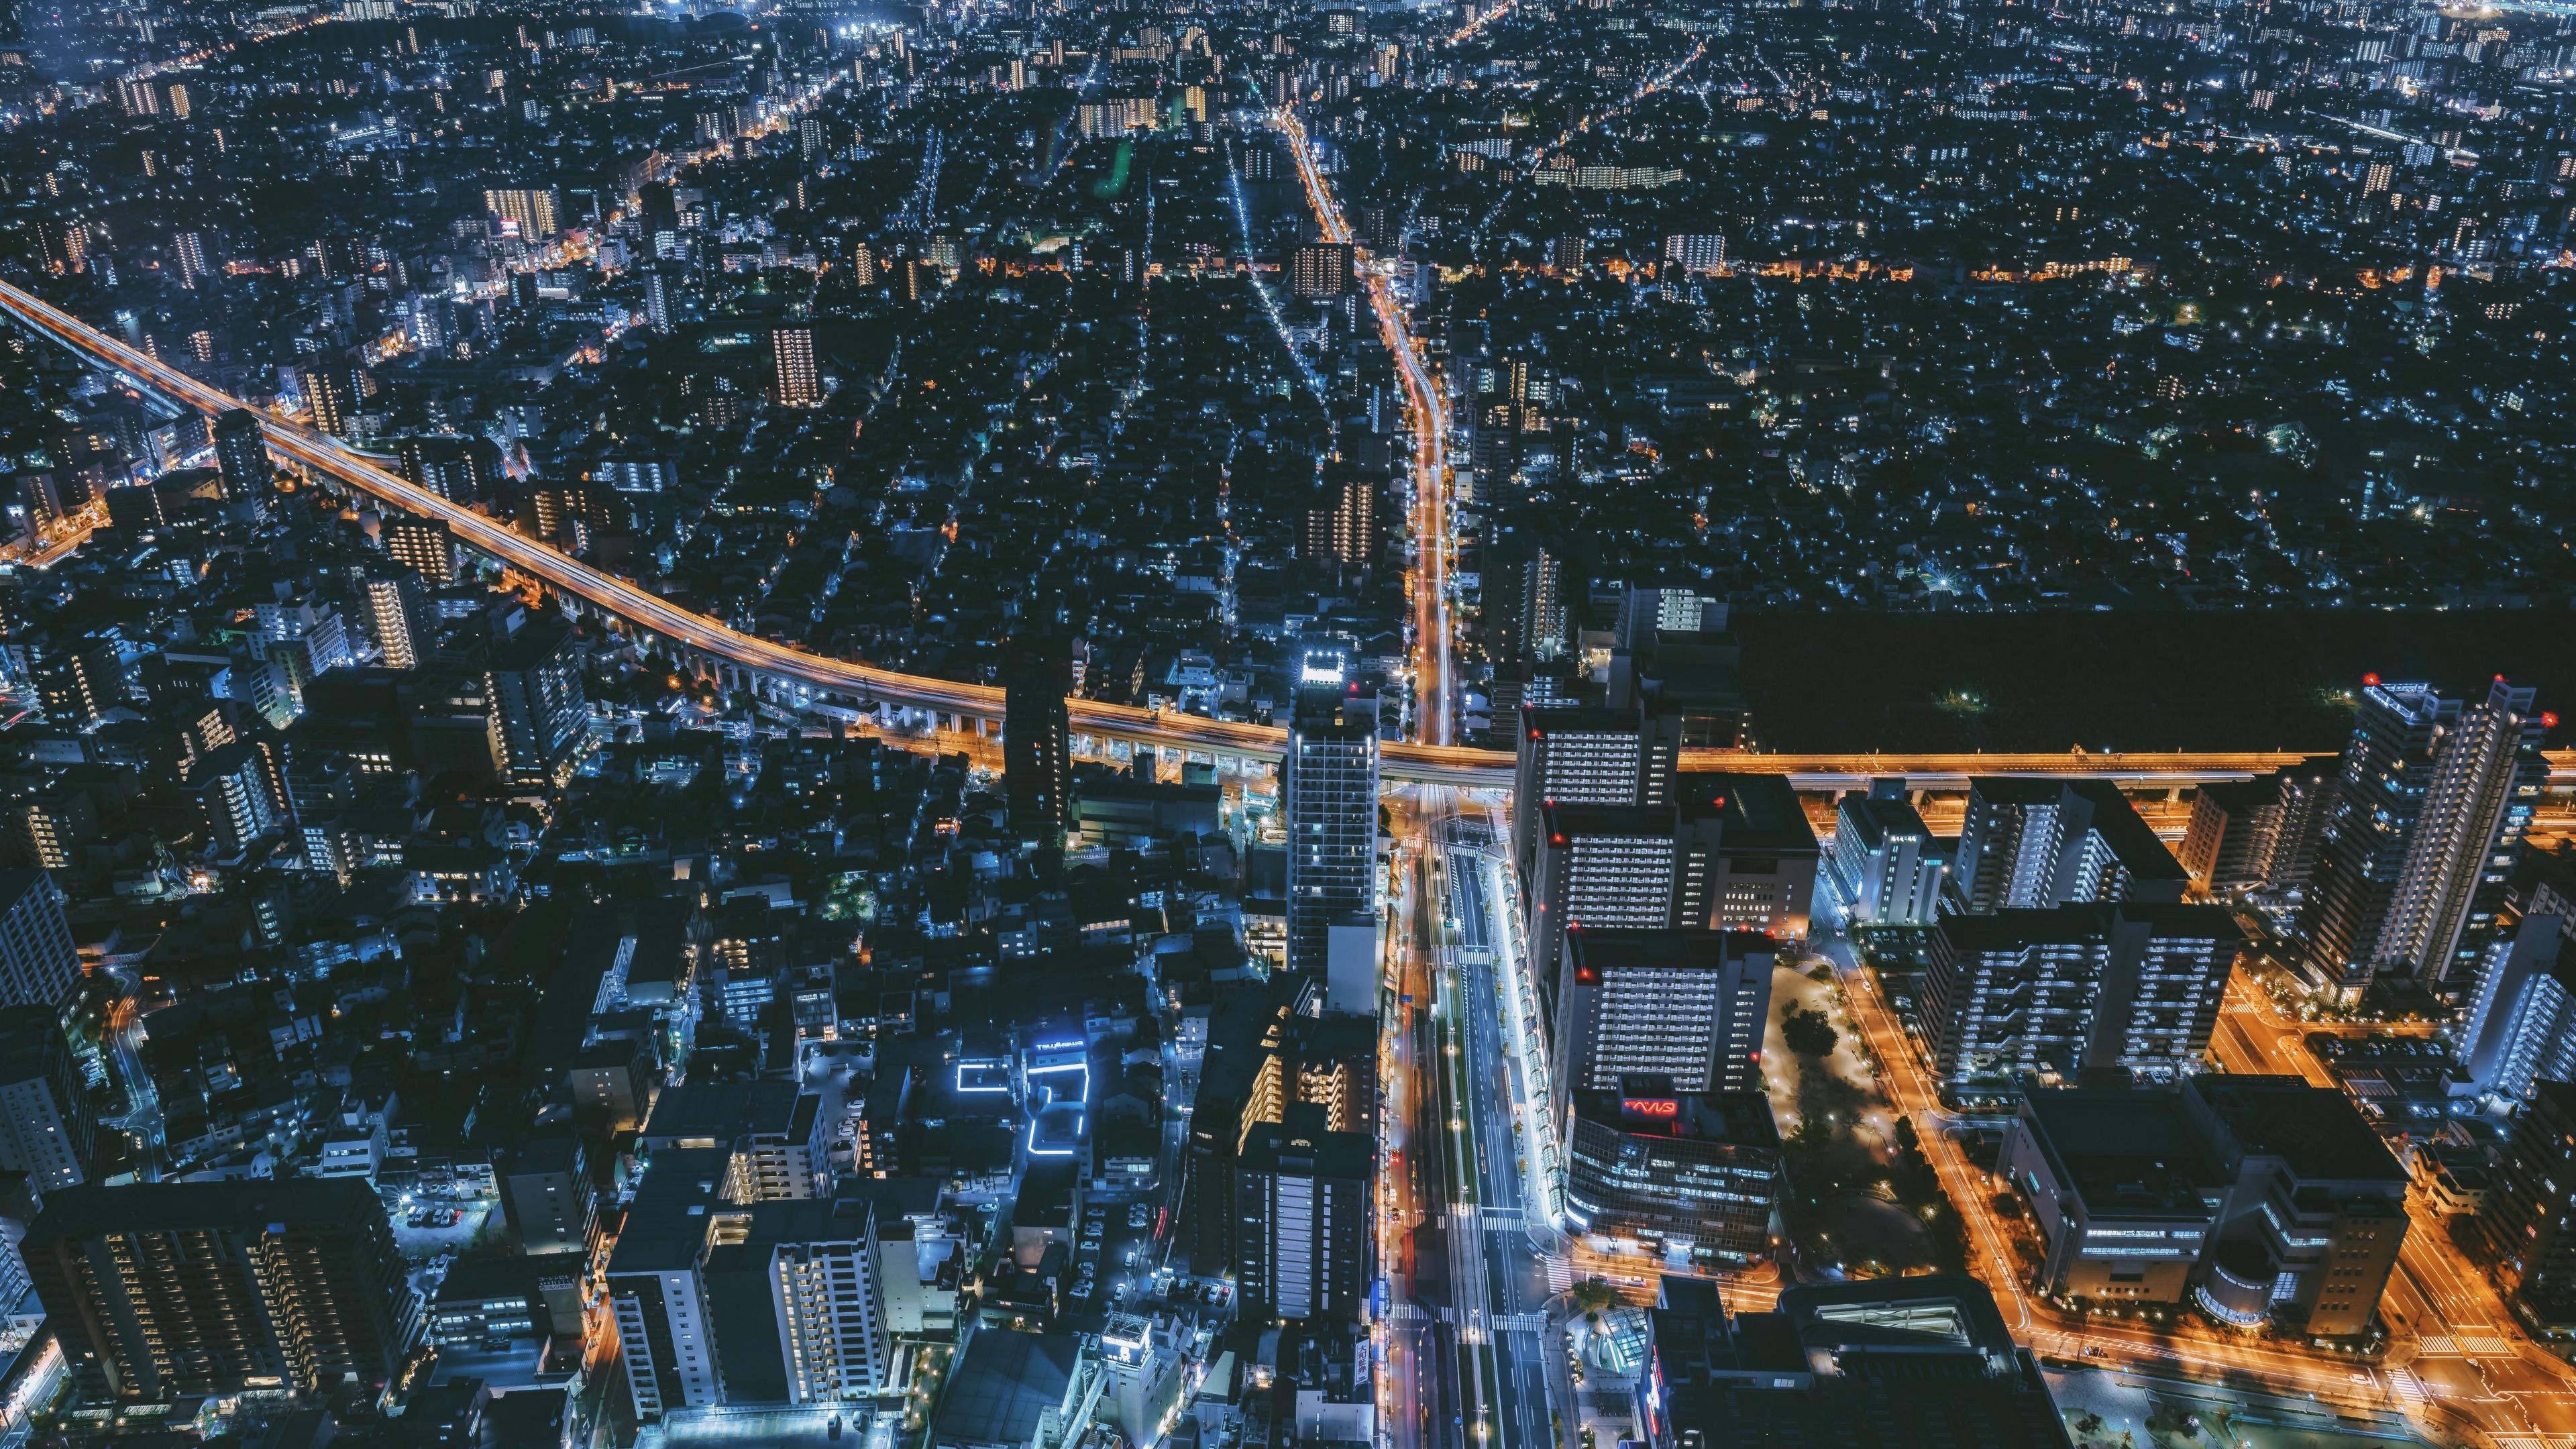 night city top view osaka japan 4k 1538066743 - night city, top view, osaka, japan 4k - top view, osaka, night city